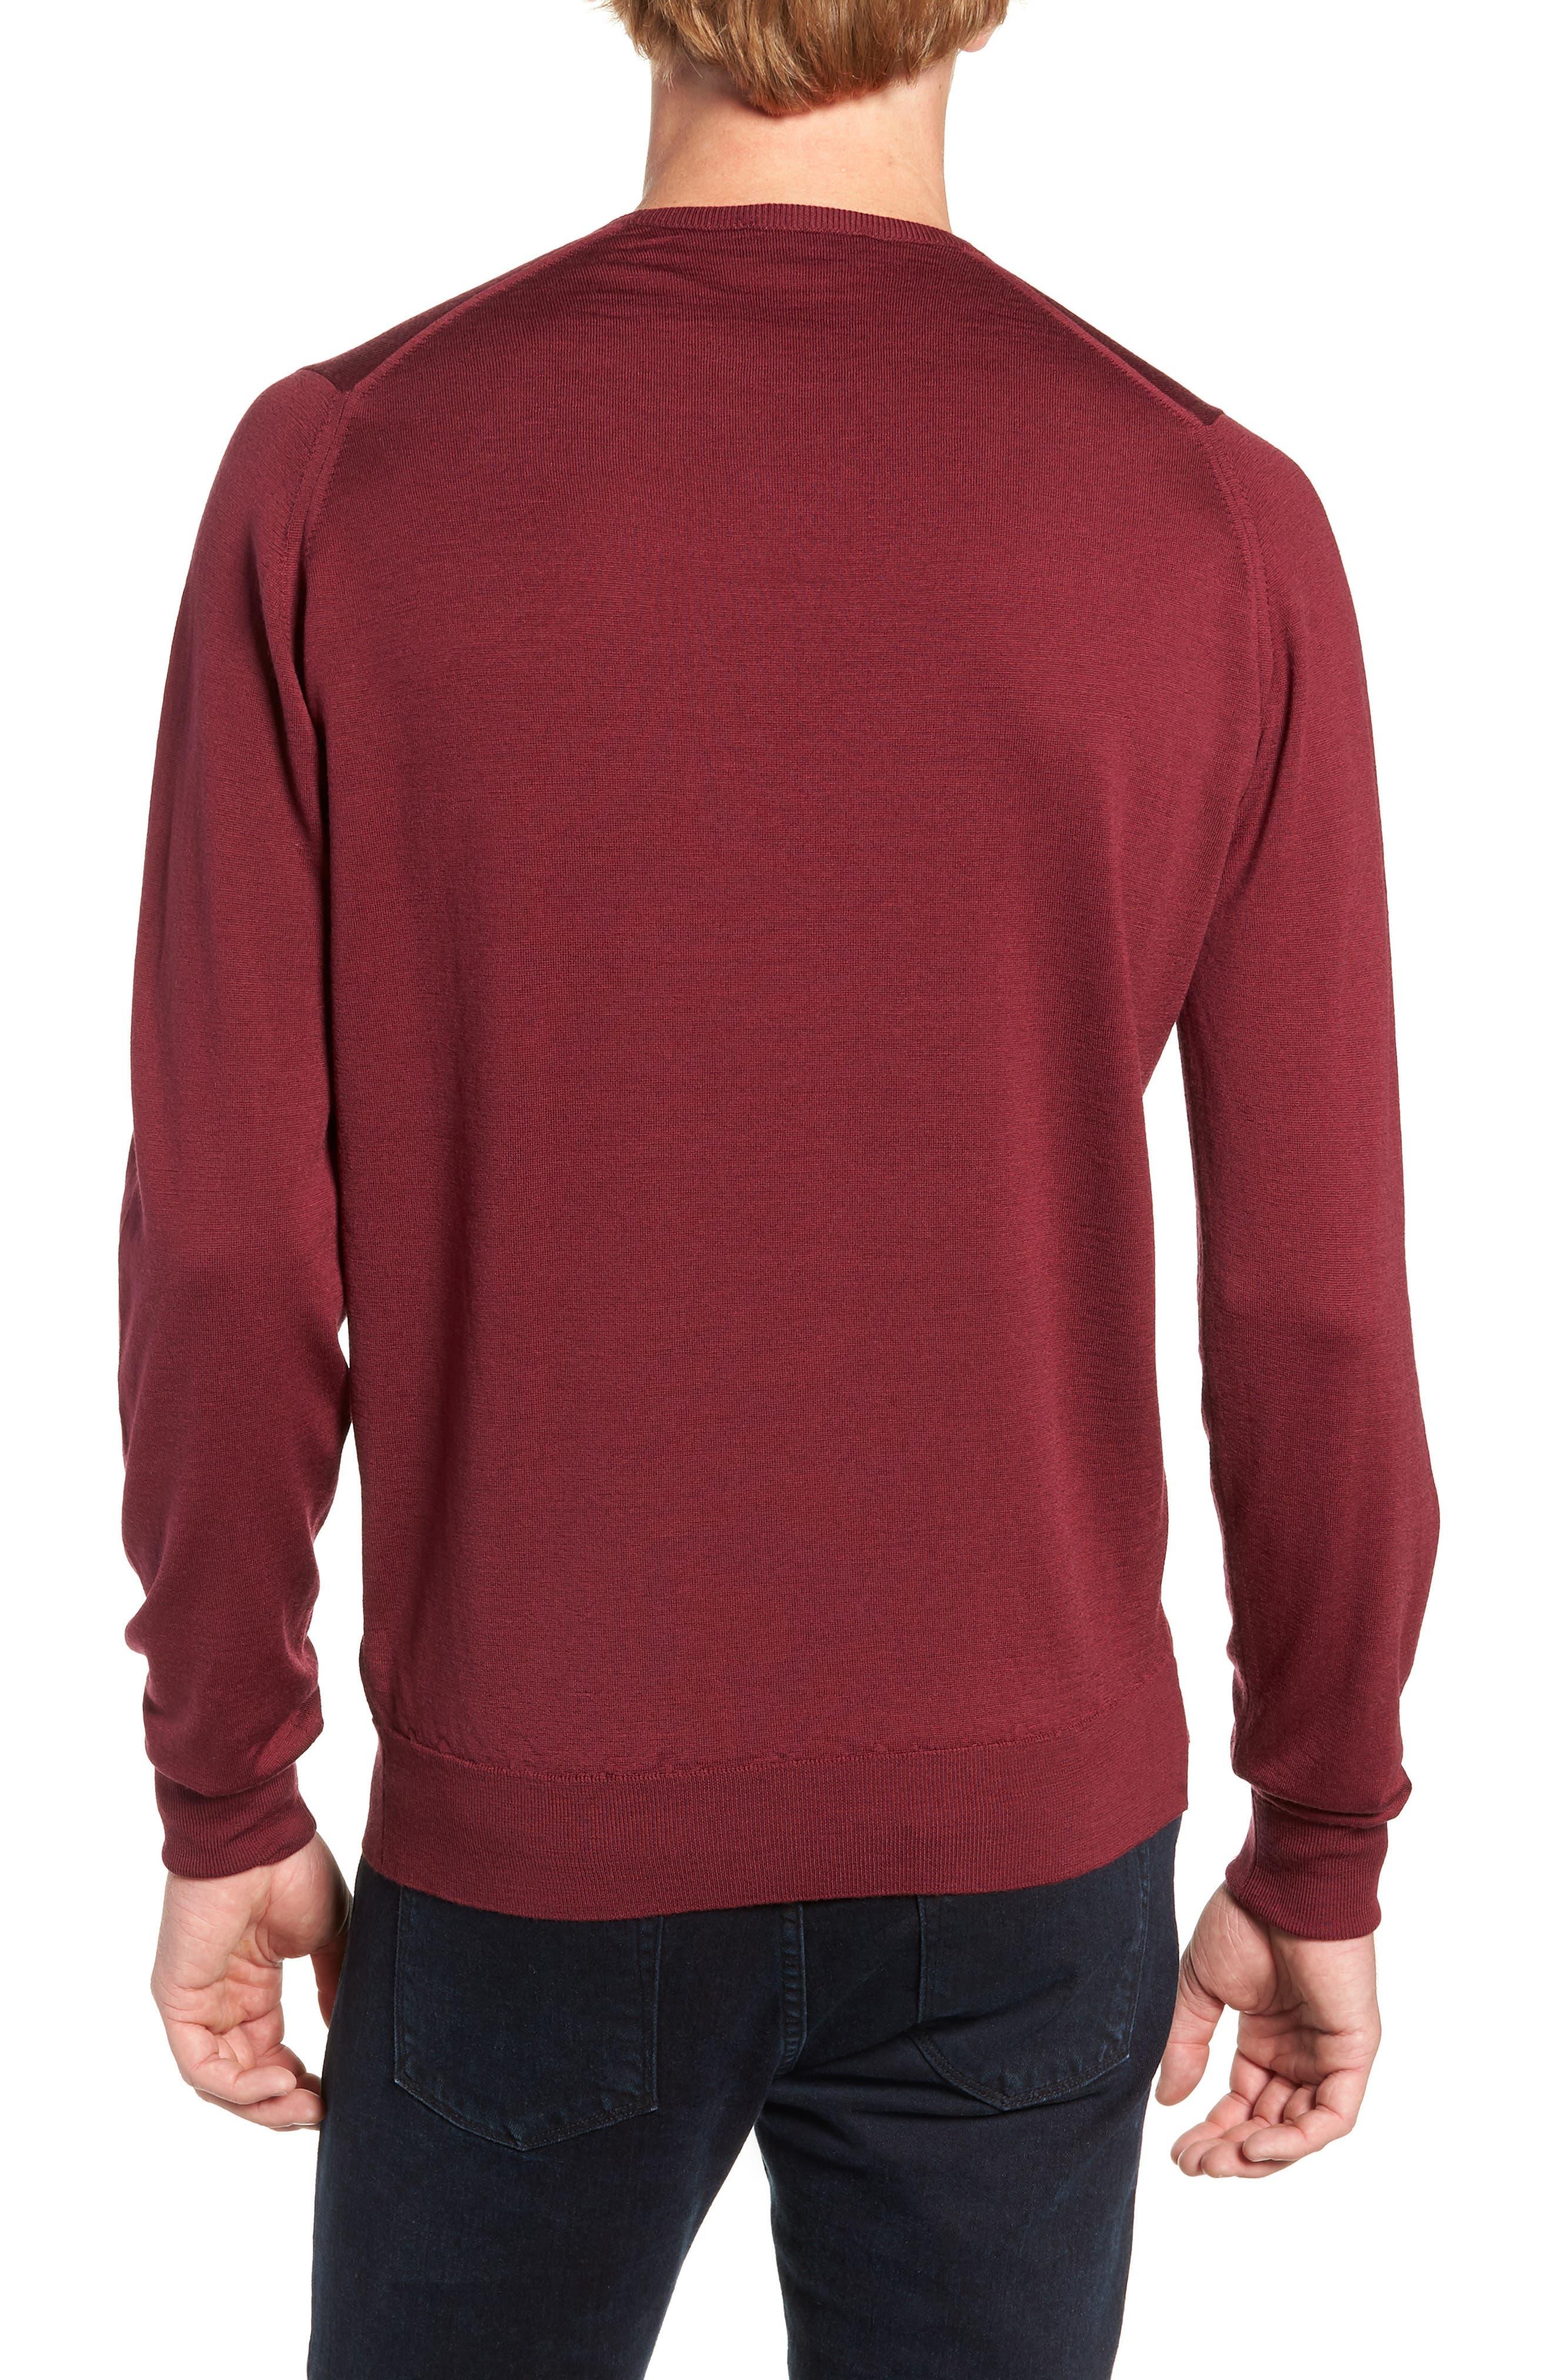 'Marcus' Easy Fit Crewneck Wool Sweater,                             Alternate thumbnail 2, color,                             BOREDAUX